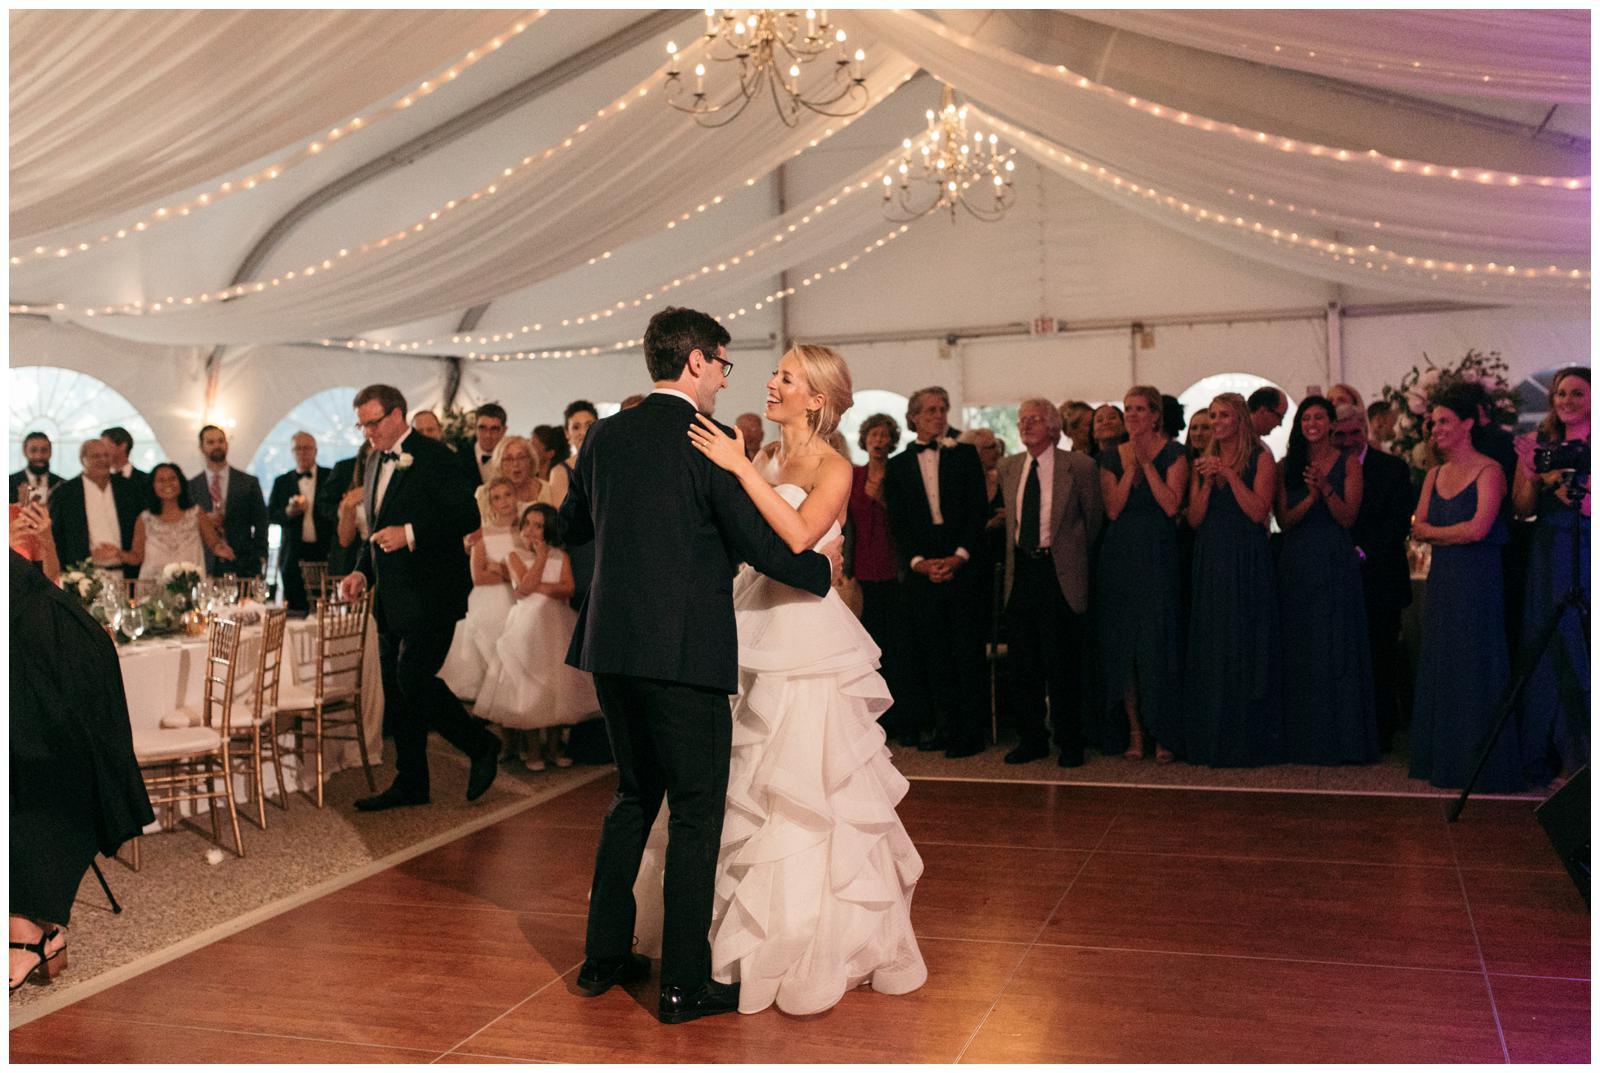 Massachusetts tent wedding venue